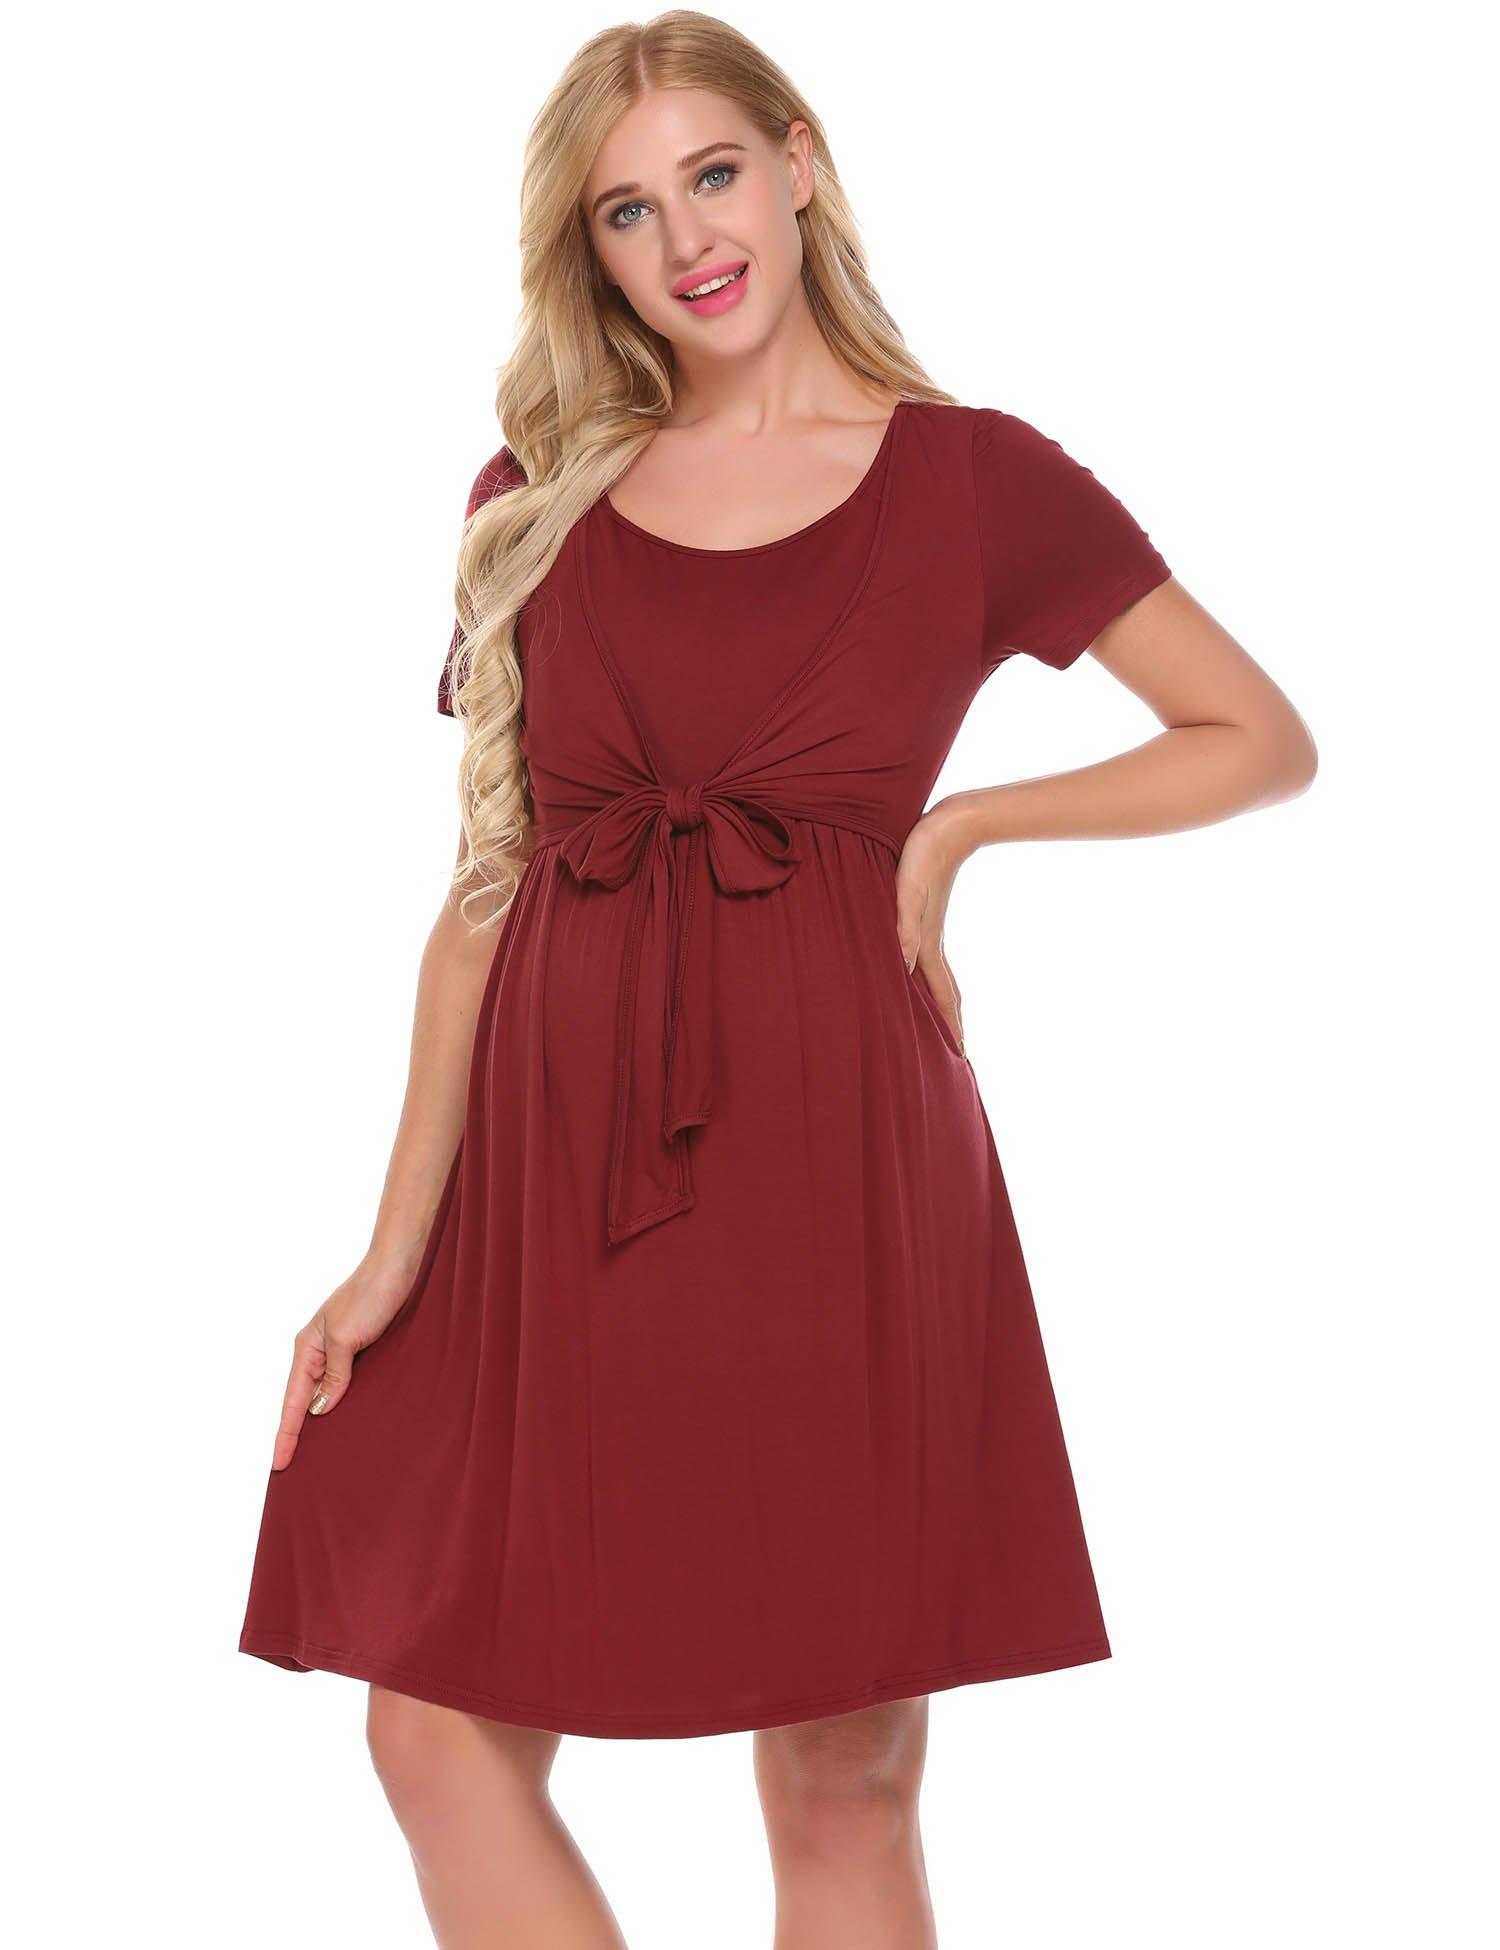 Women's Elegant Short Sleeve Wear to Work Casual Maternity Dress Nursing Nightgown